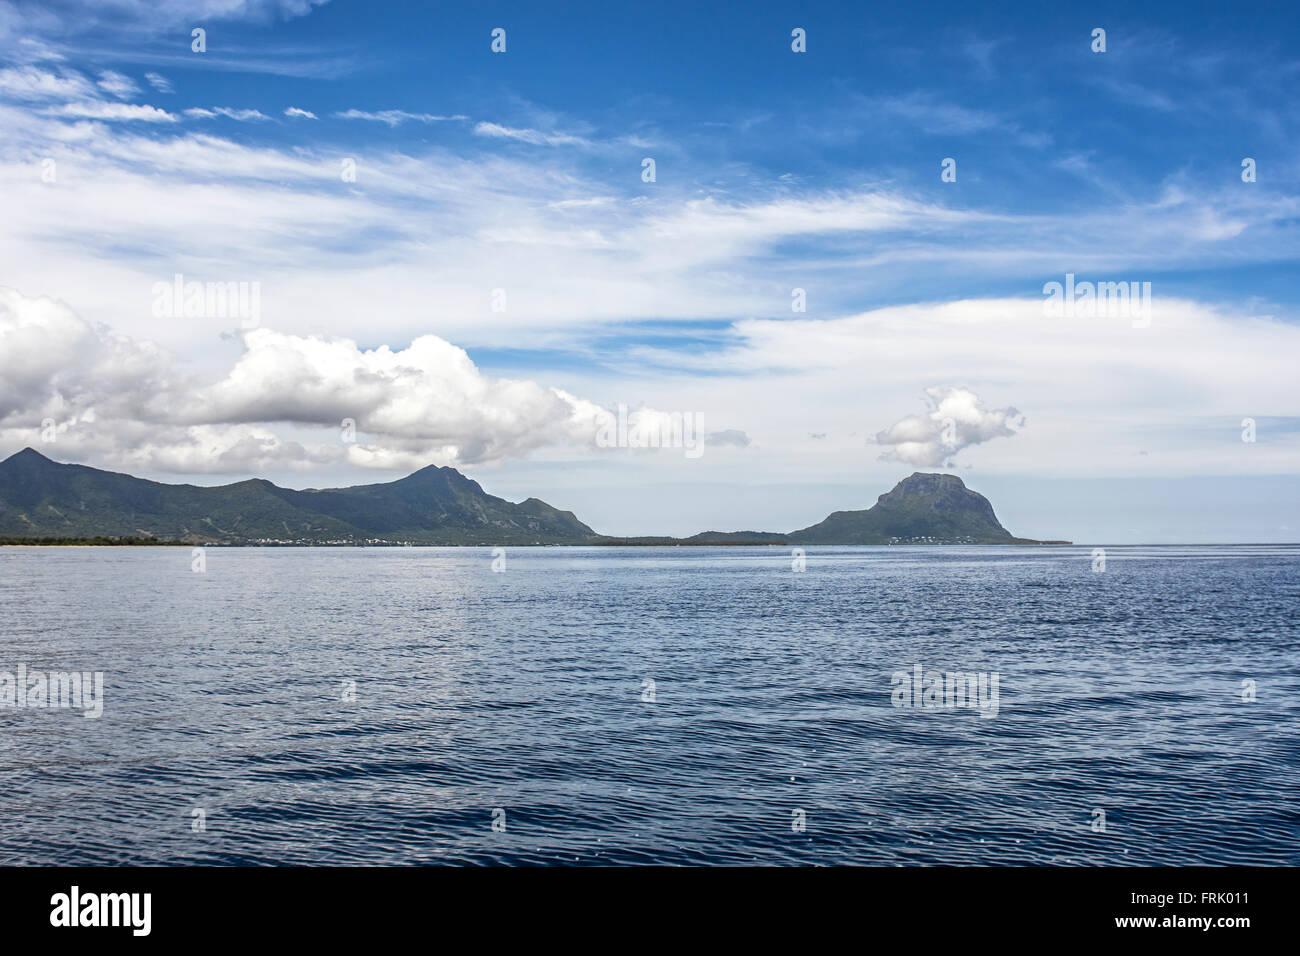 Mauritius - Stock Image